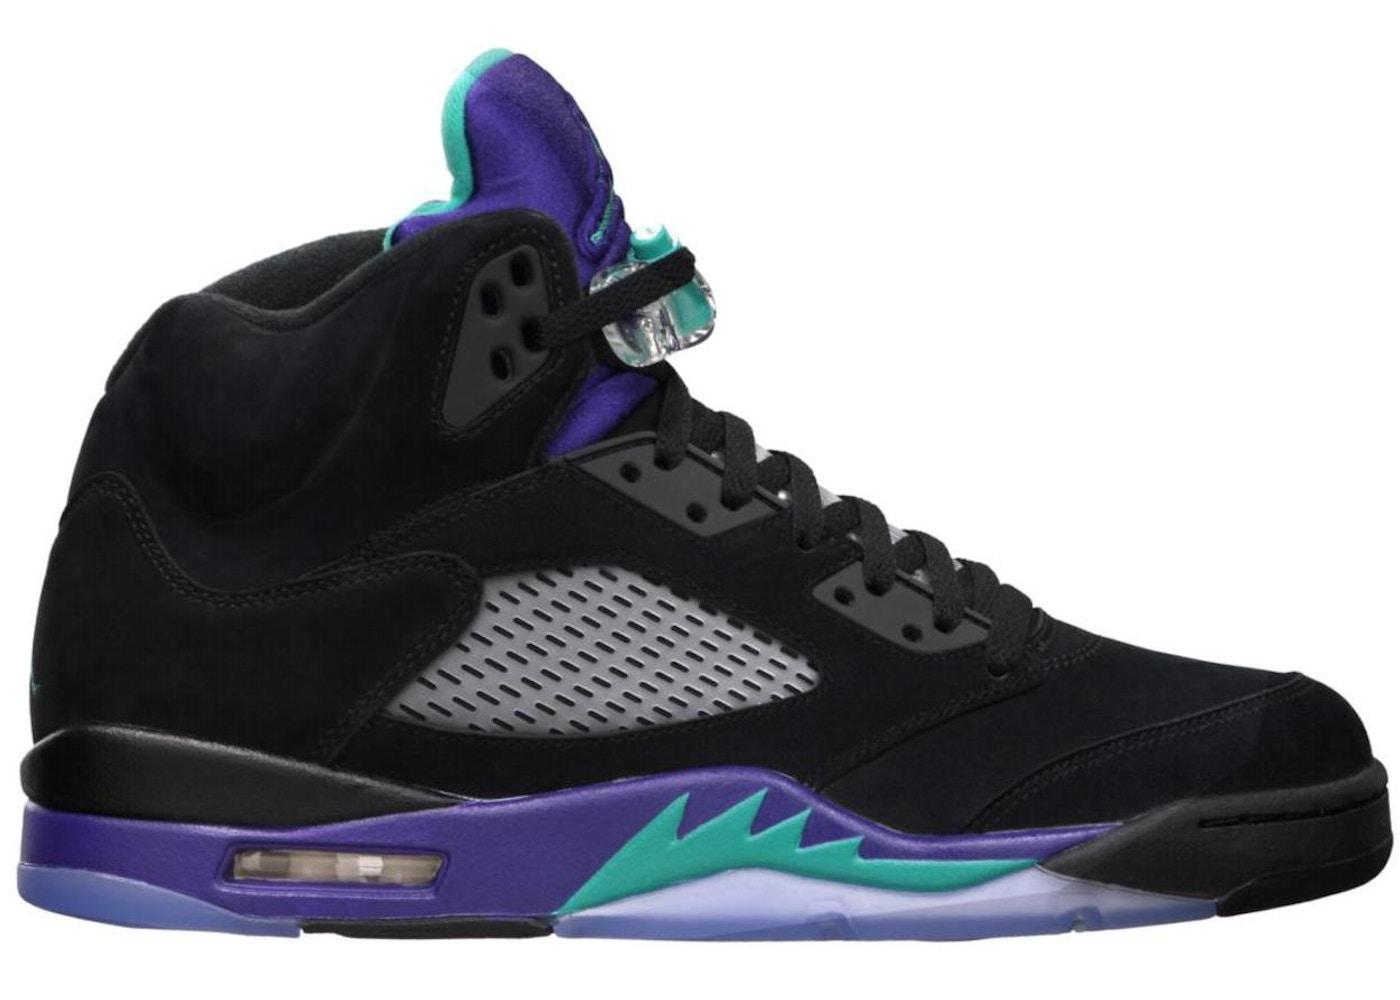 info for d9763 91260 Jordan 5 Retro Black Grape (2013) - 136027-007